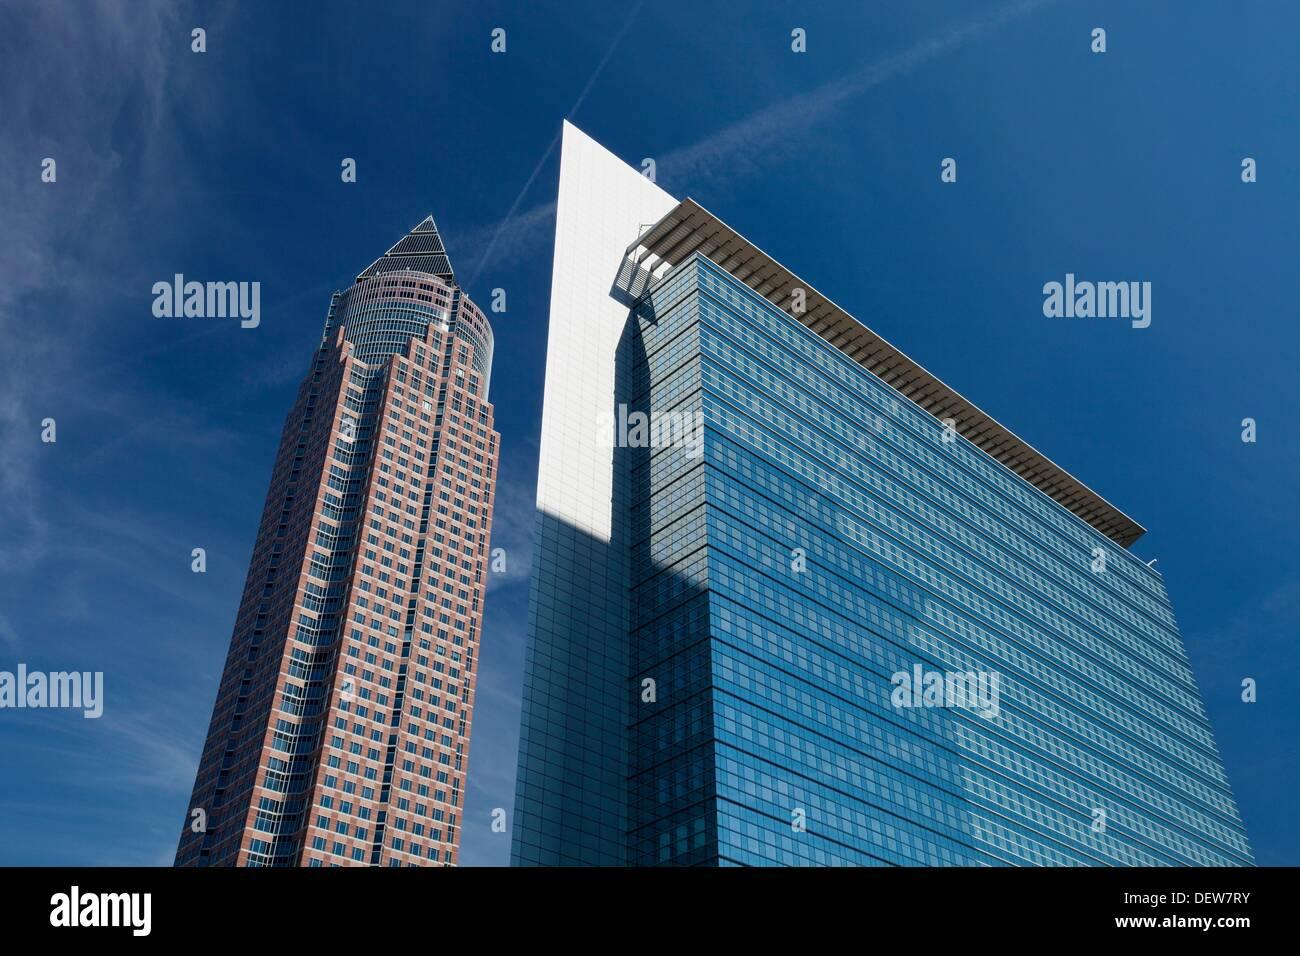 Messeturm, symbol of the fair trade area in Frankfurt, Germany - Stock Image